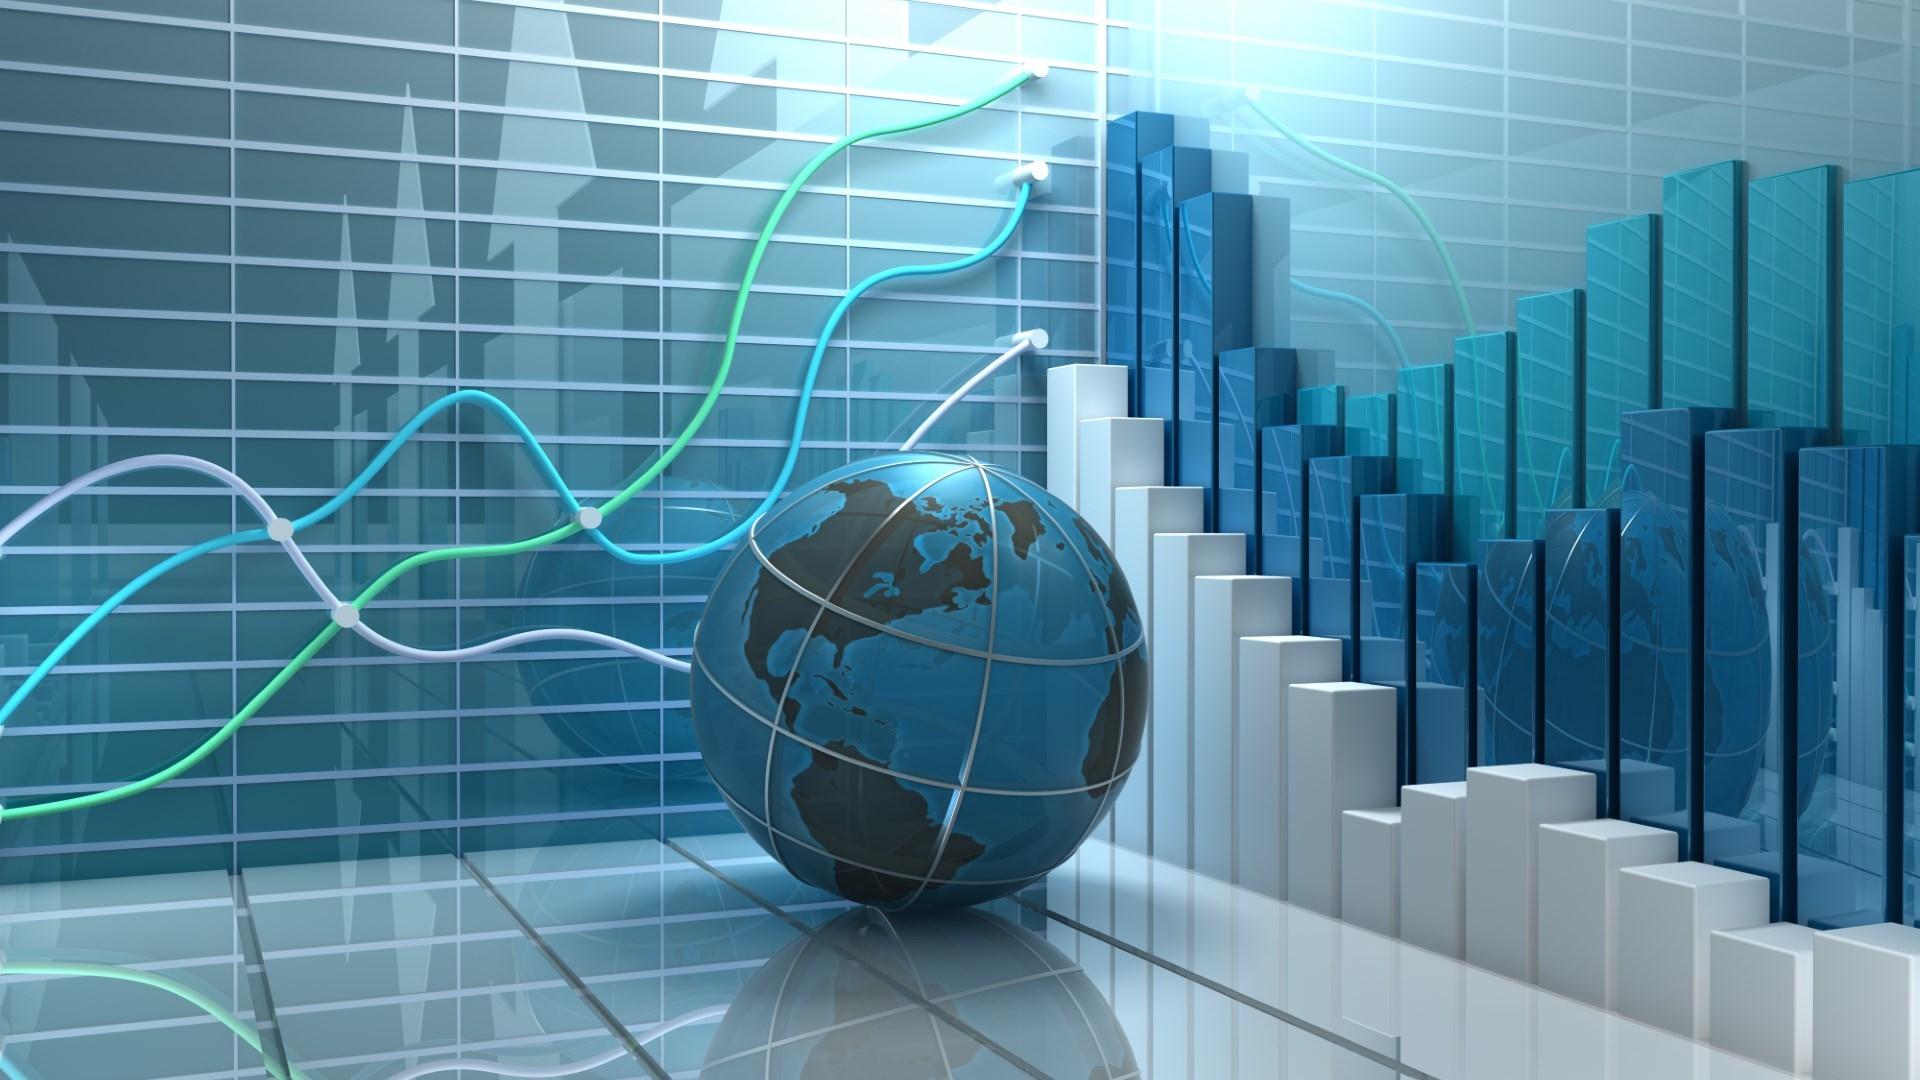 Presentation Economy Wallpaper